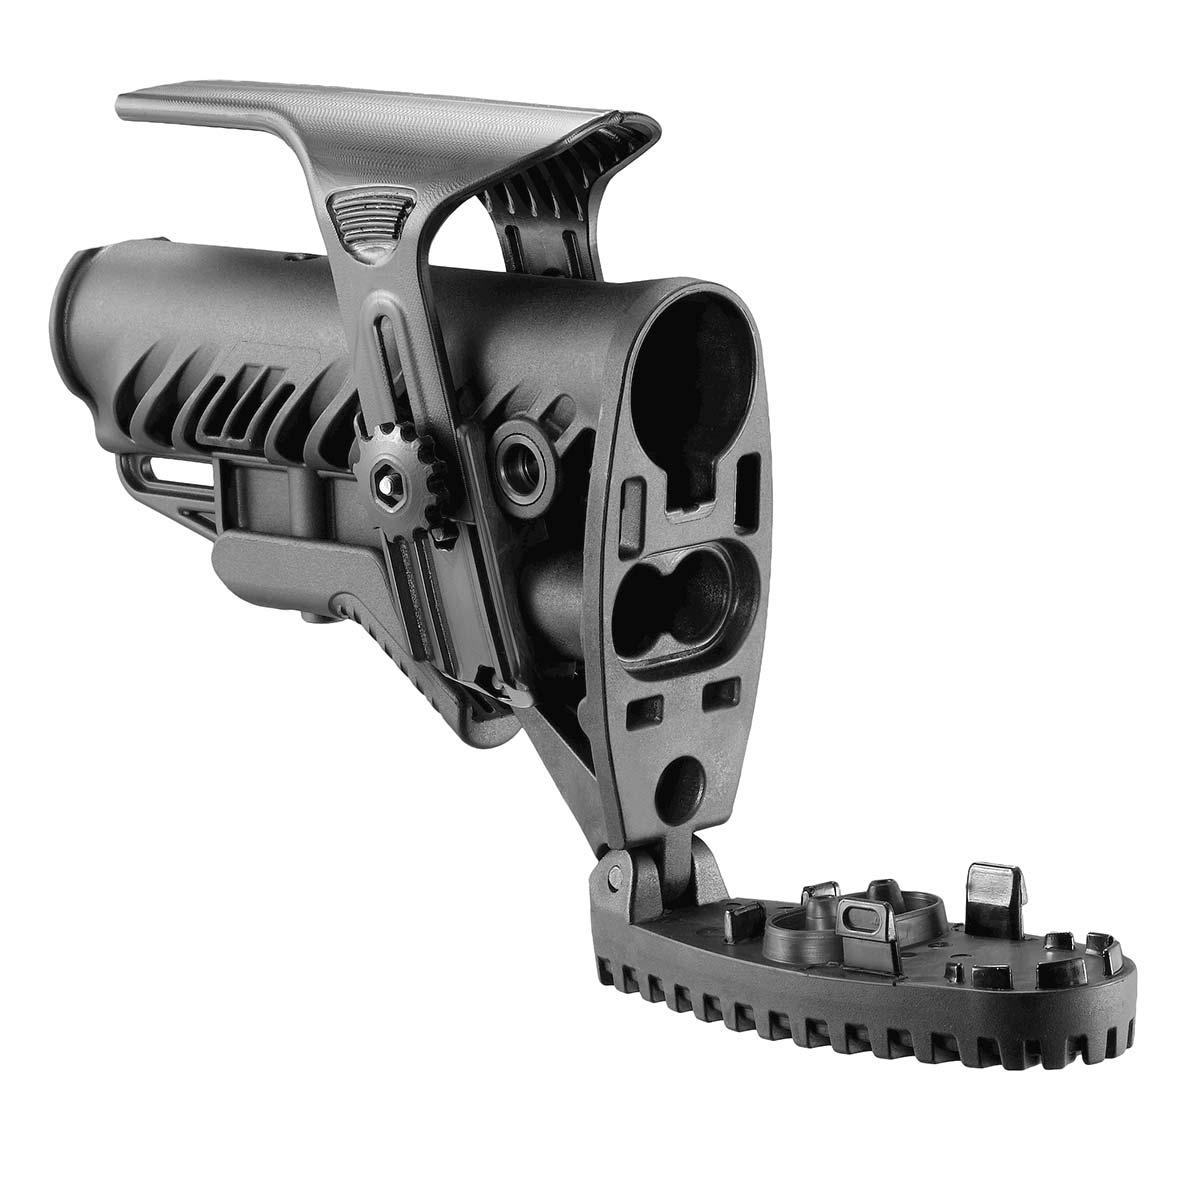 fab-defense-ar15-butt-stock-glr-16-3